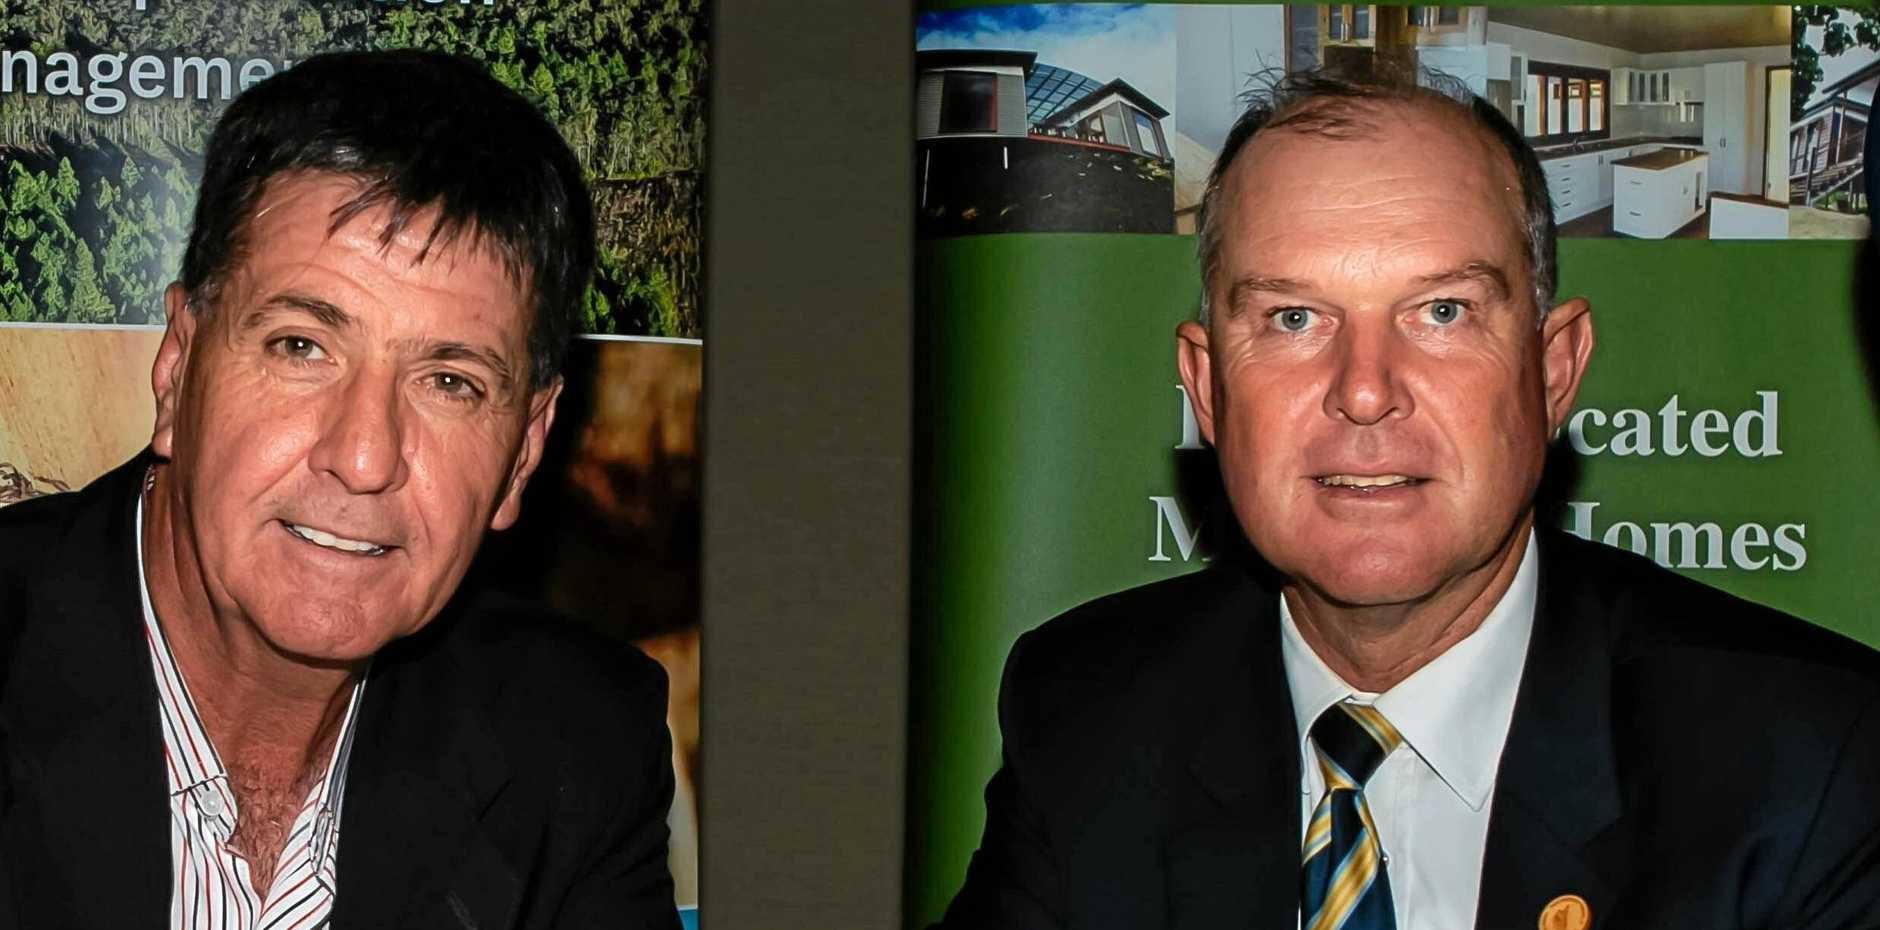 Images: Bruce Saunders MP, Member for Maryborough, Tony Perrett MP, Member for Gympie